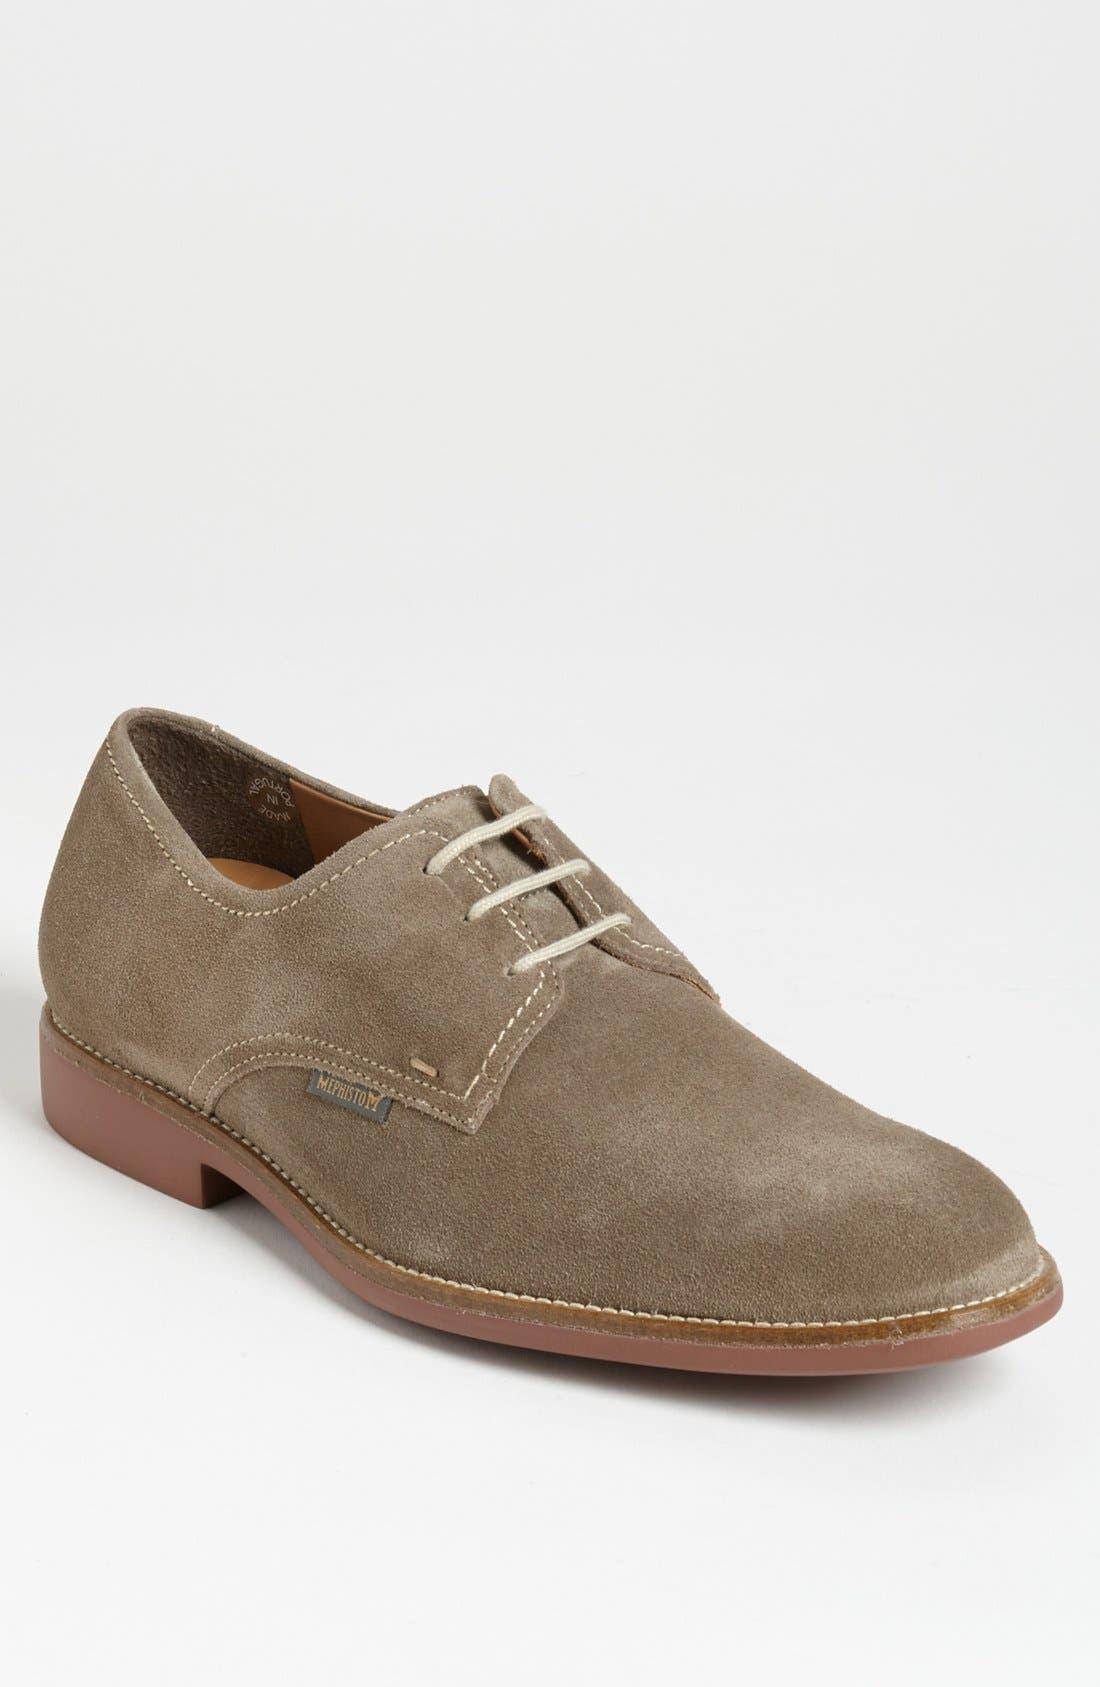 Main Image - Mephisto 'Fernio' Buck Shoe